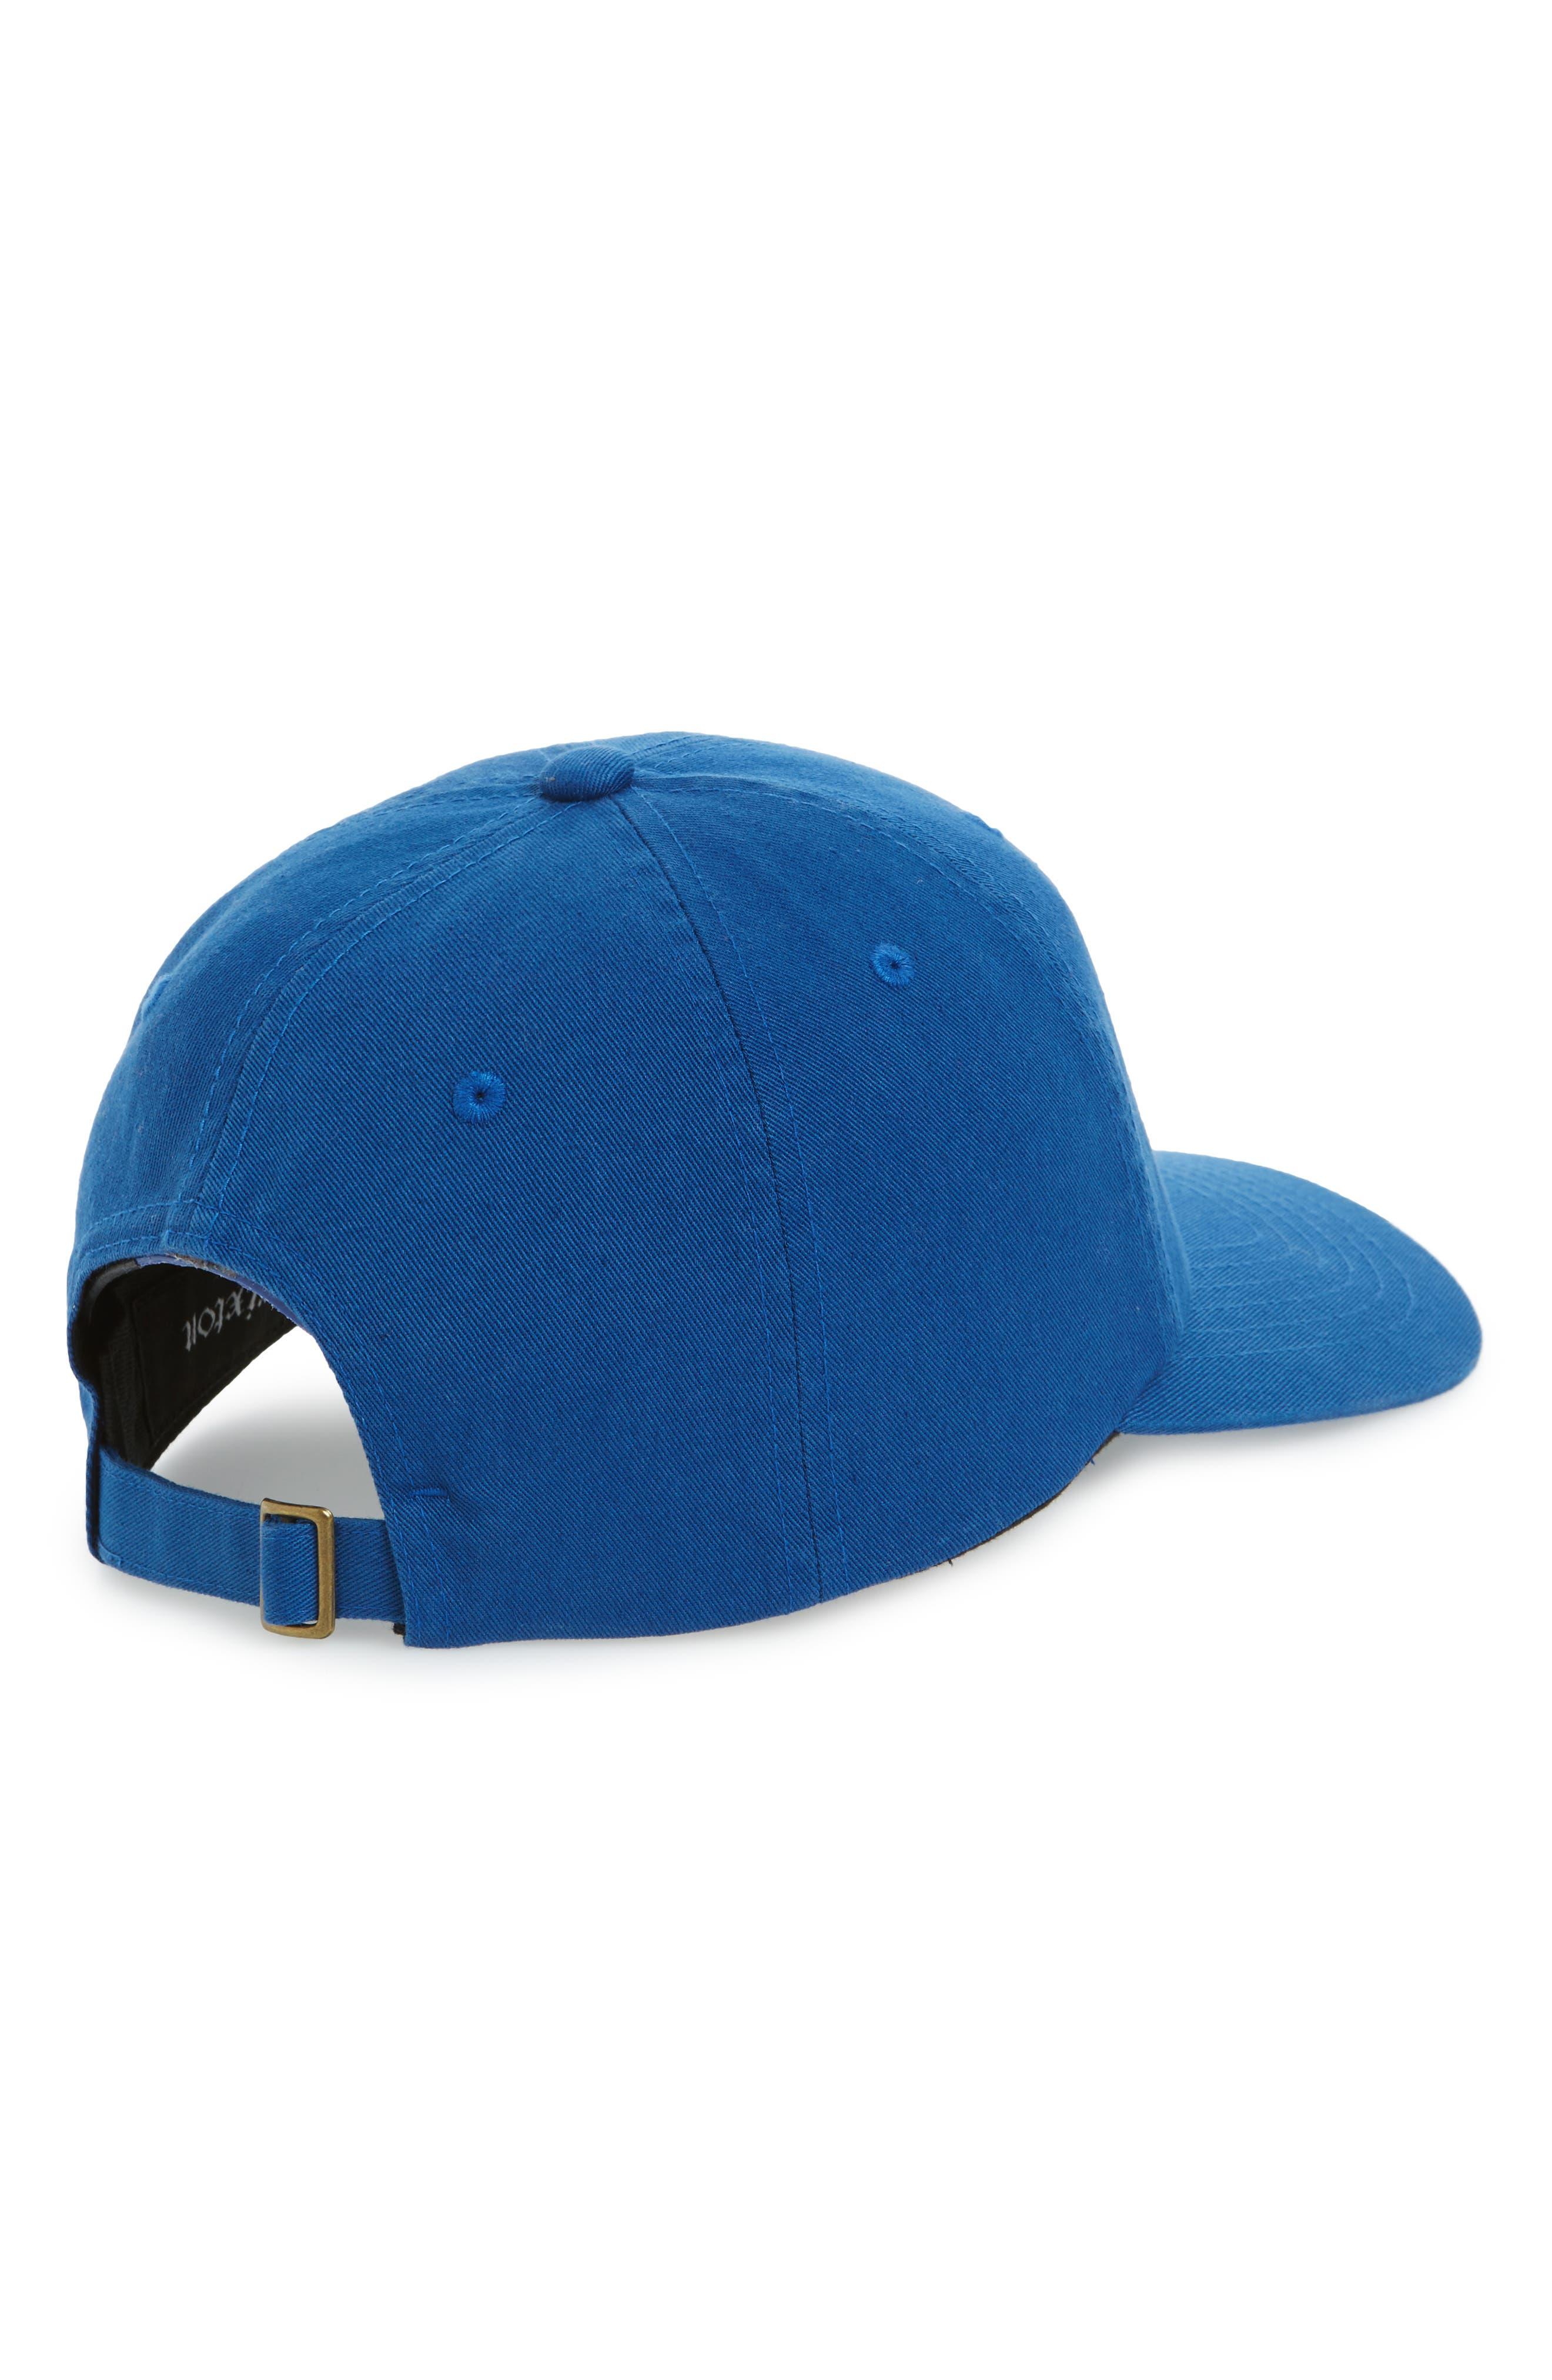 Stowell Baseball Cap,                             Alternate thumbnail 2, color,                             ROYAL